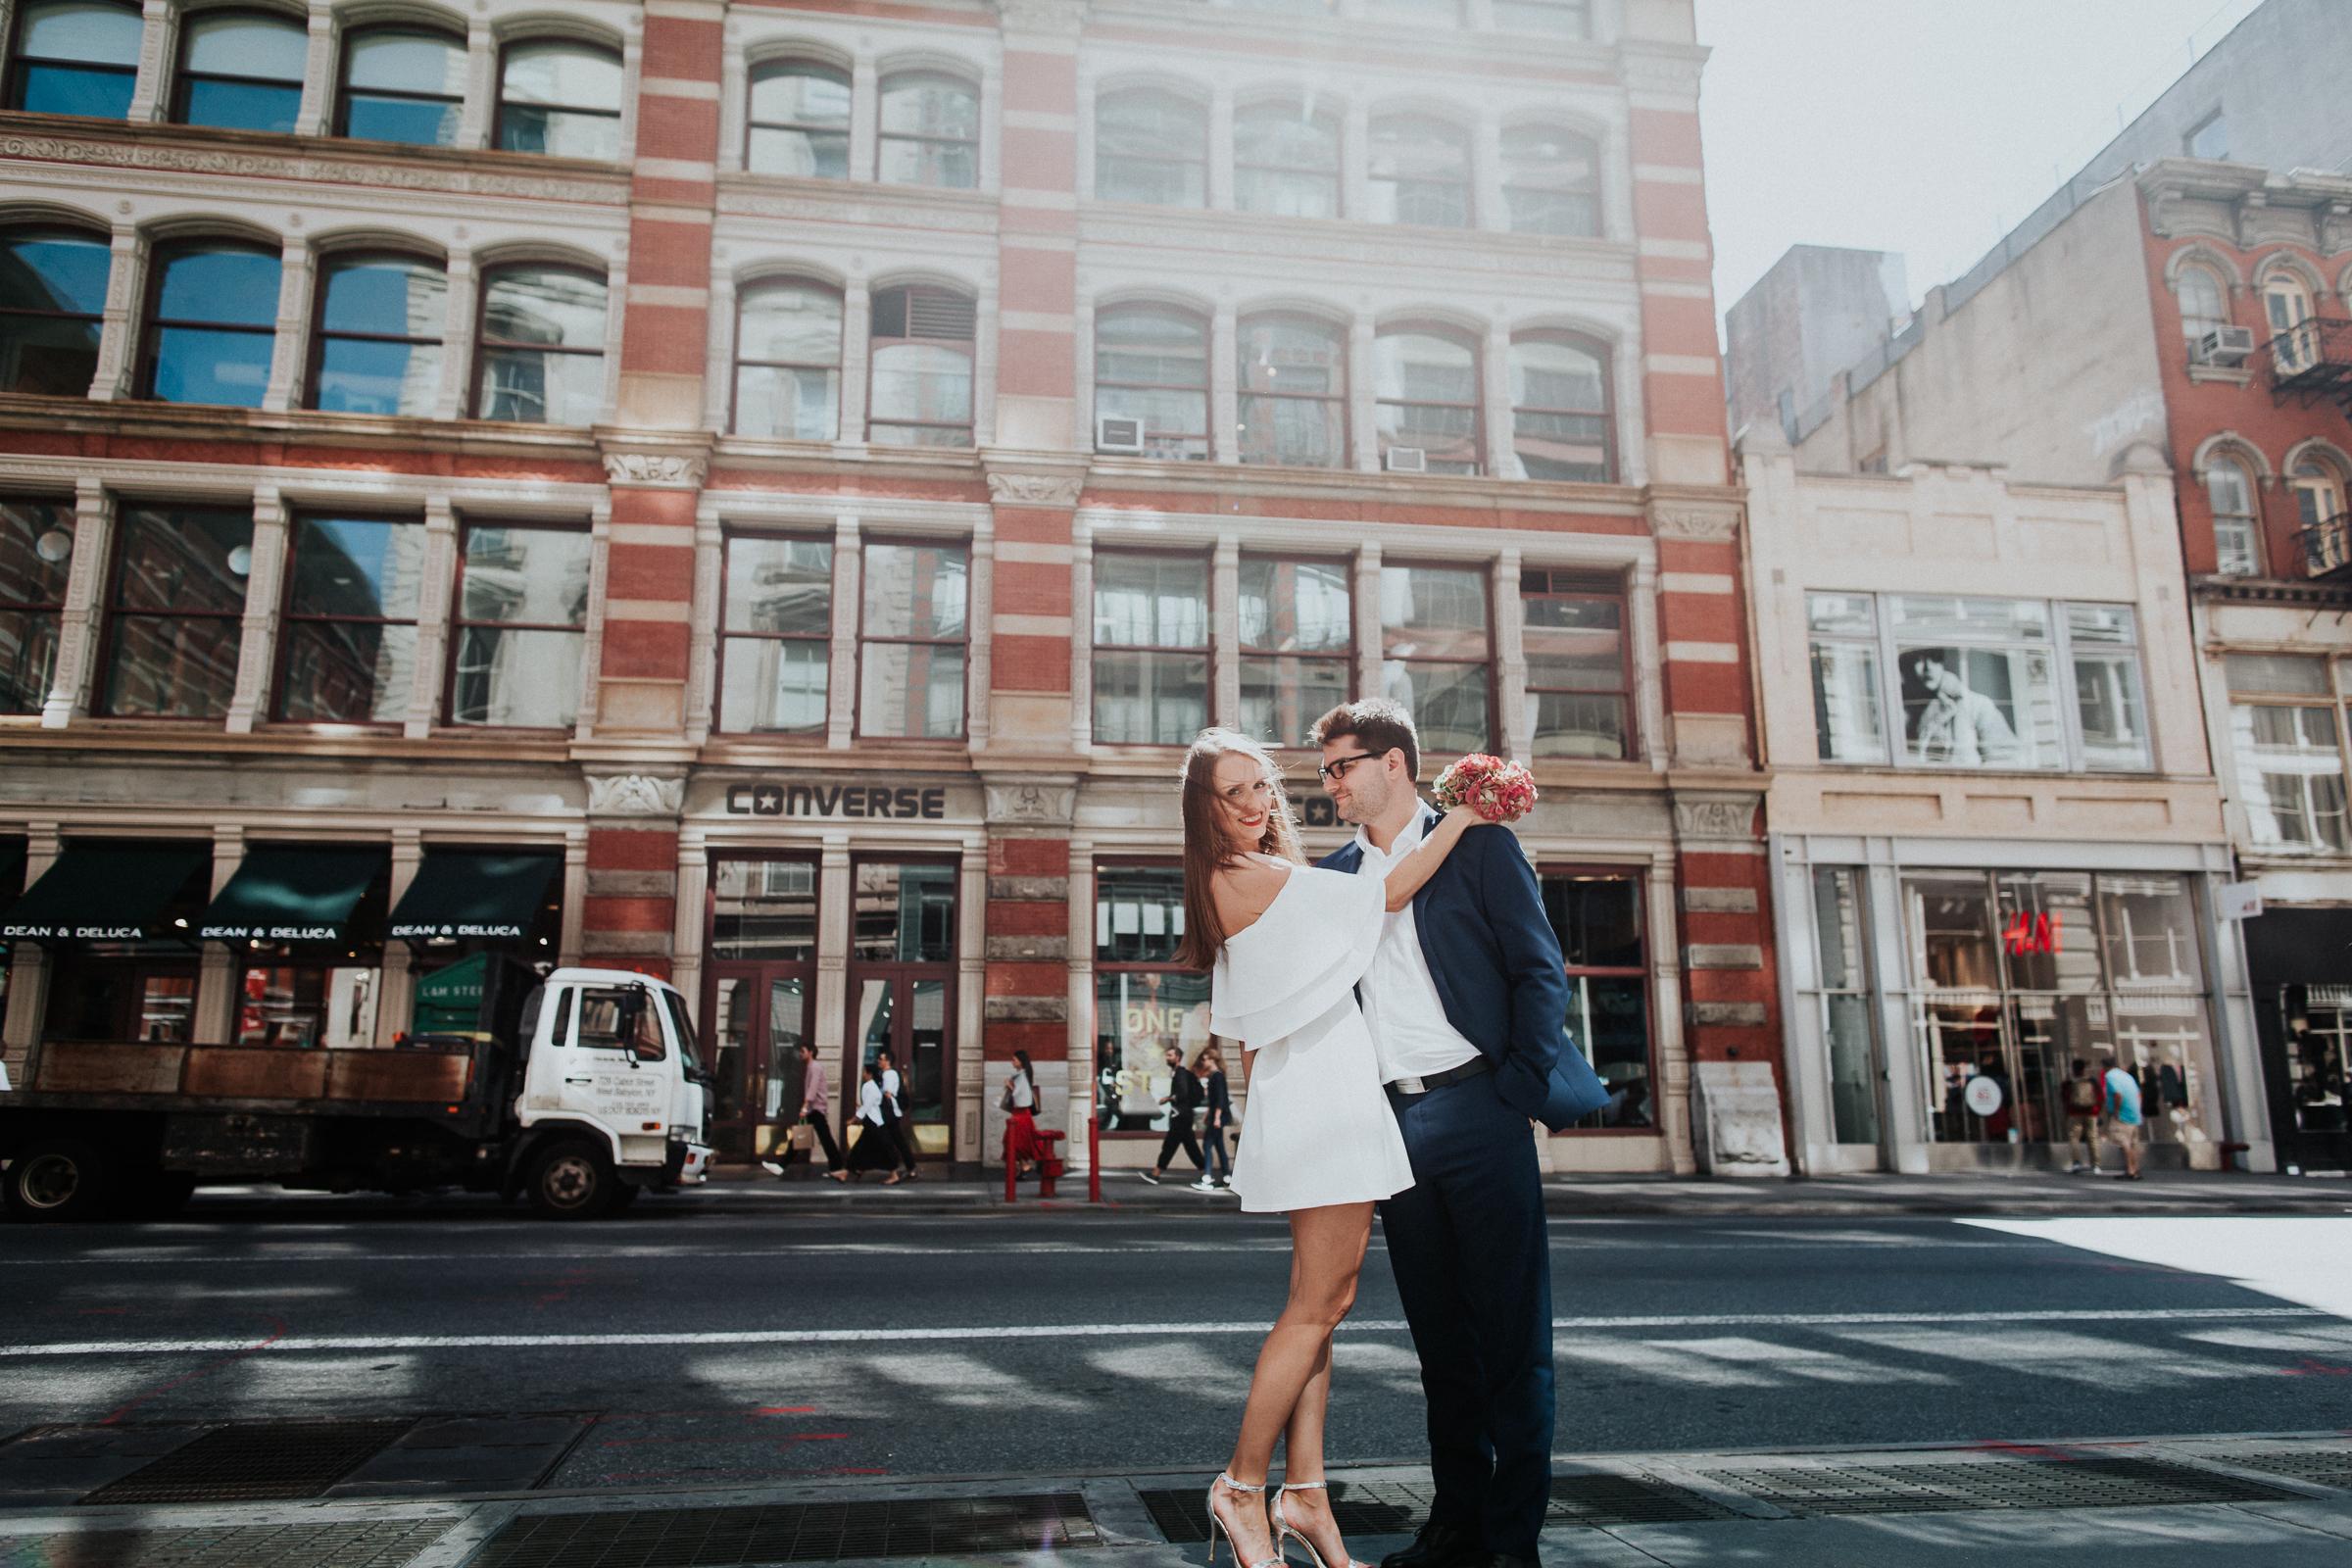 New-York-City-Hall-Elopement-NYC-Documentary-Wedding-Photographer-39.jpg